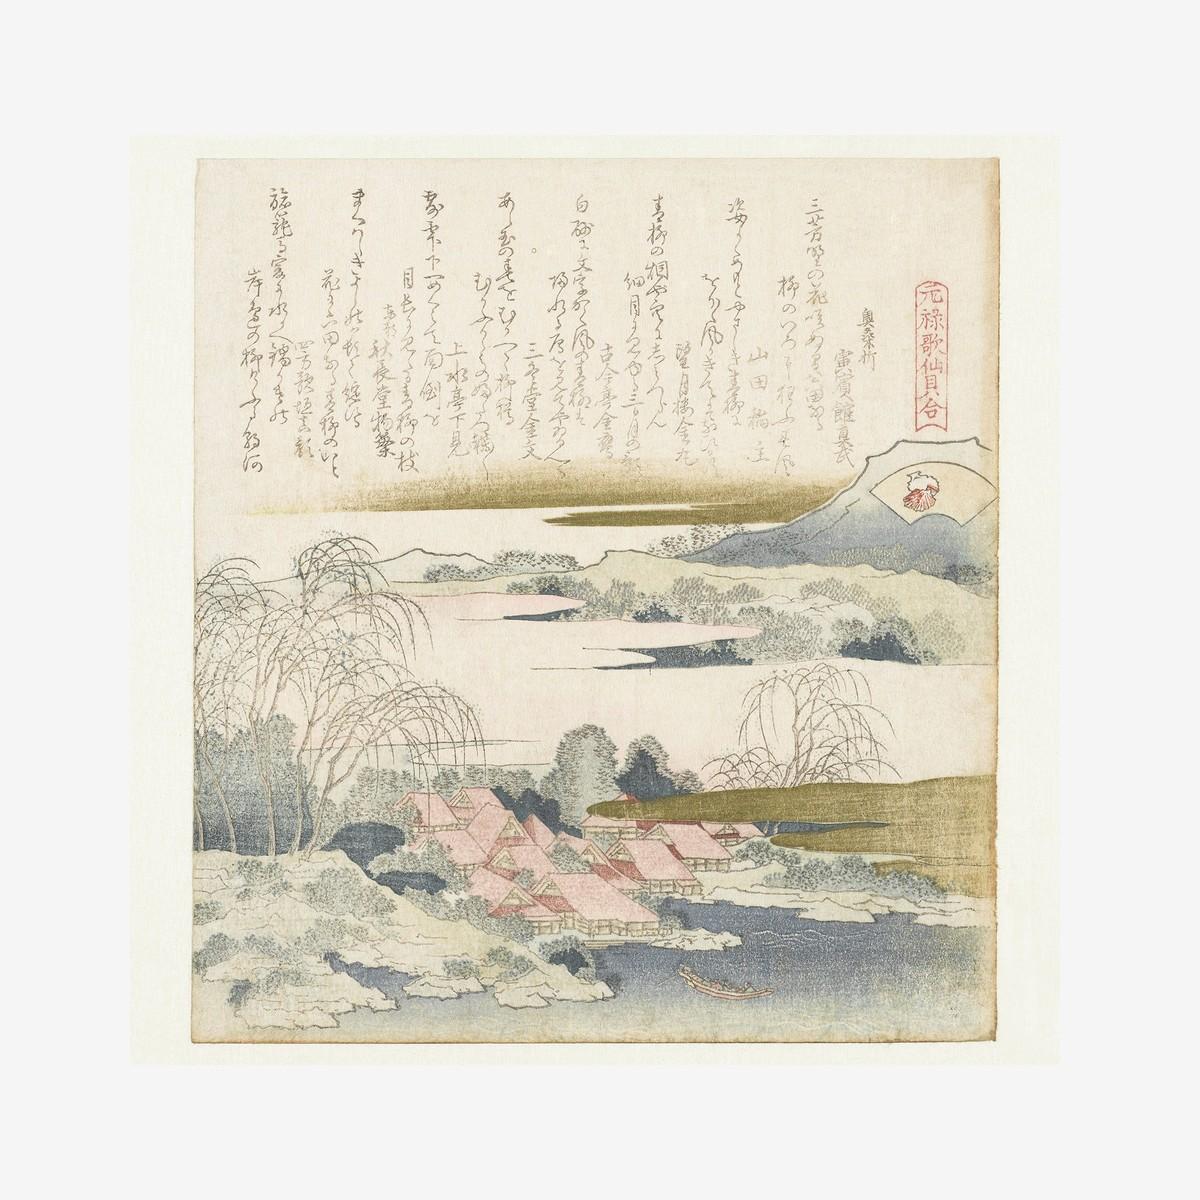 Photo of Genroku Shell Print: Mutsuda